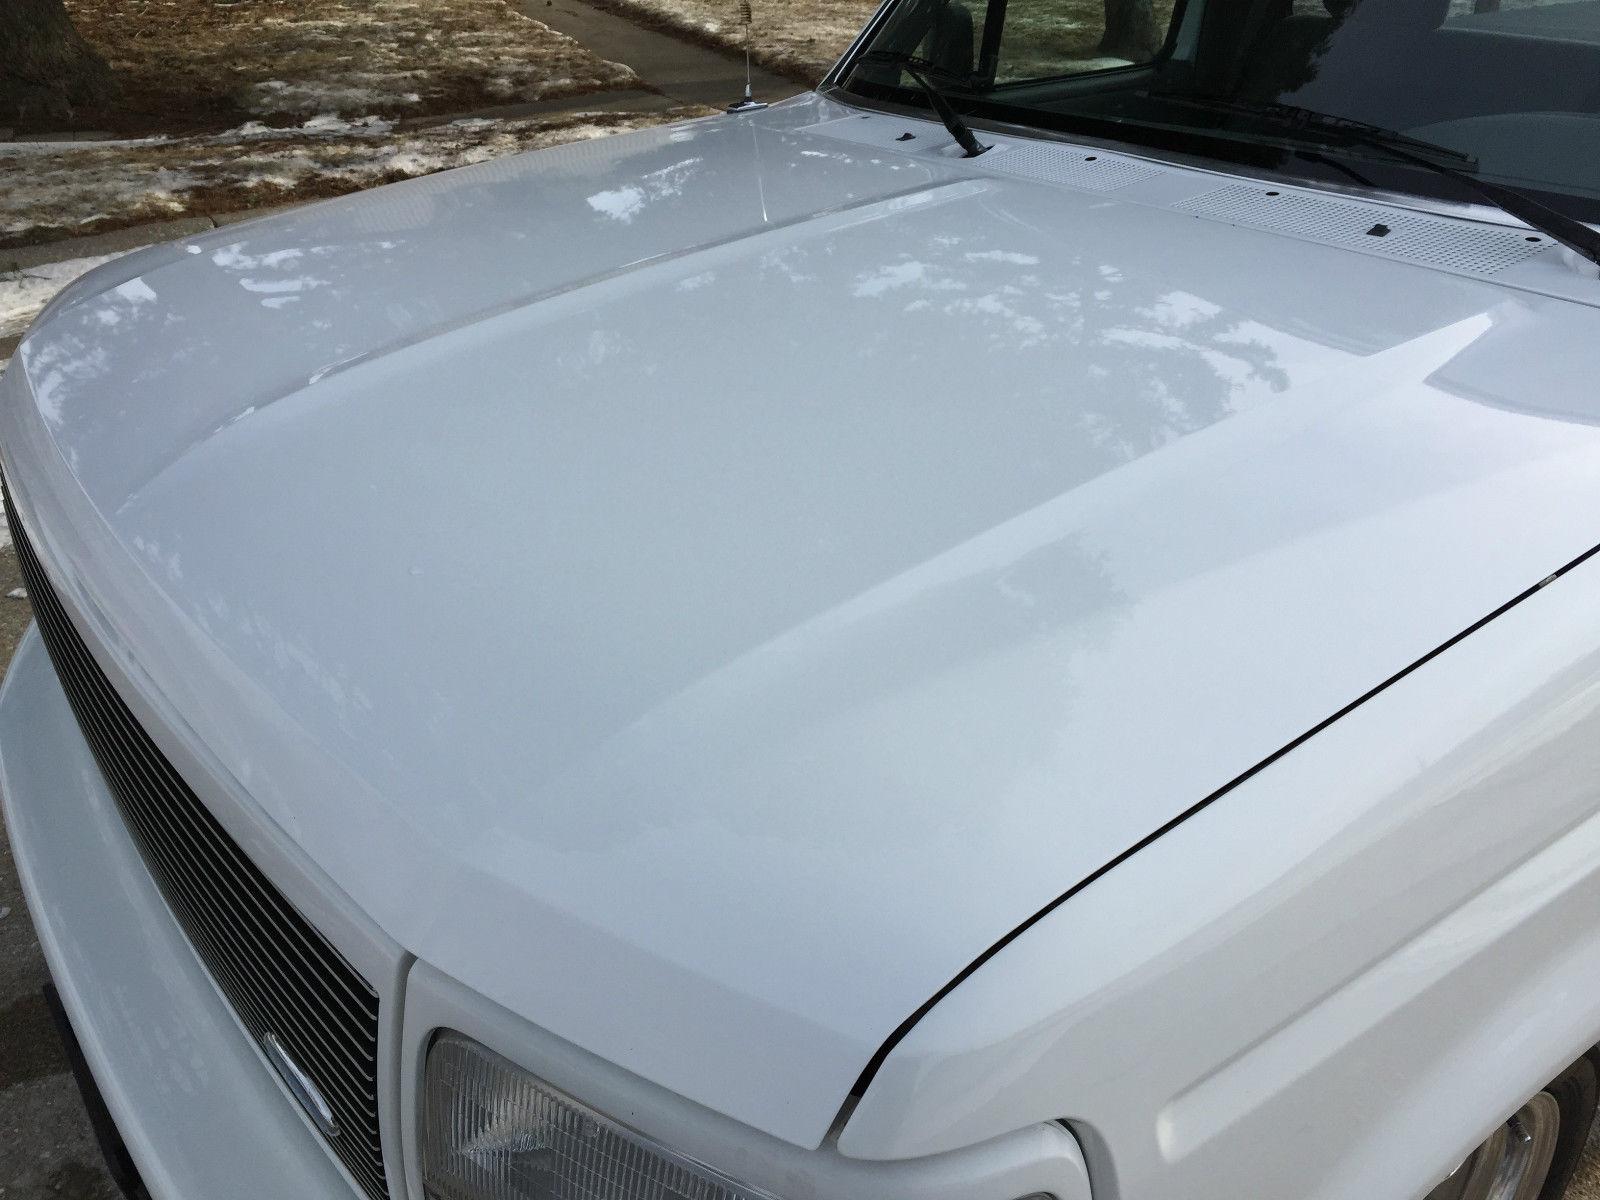 Ford F Xl Standard Cab Pickup Wd Shortbox Lowered Custom on 1994 Ford Lightning Transmission Information